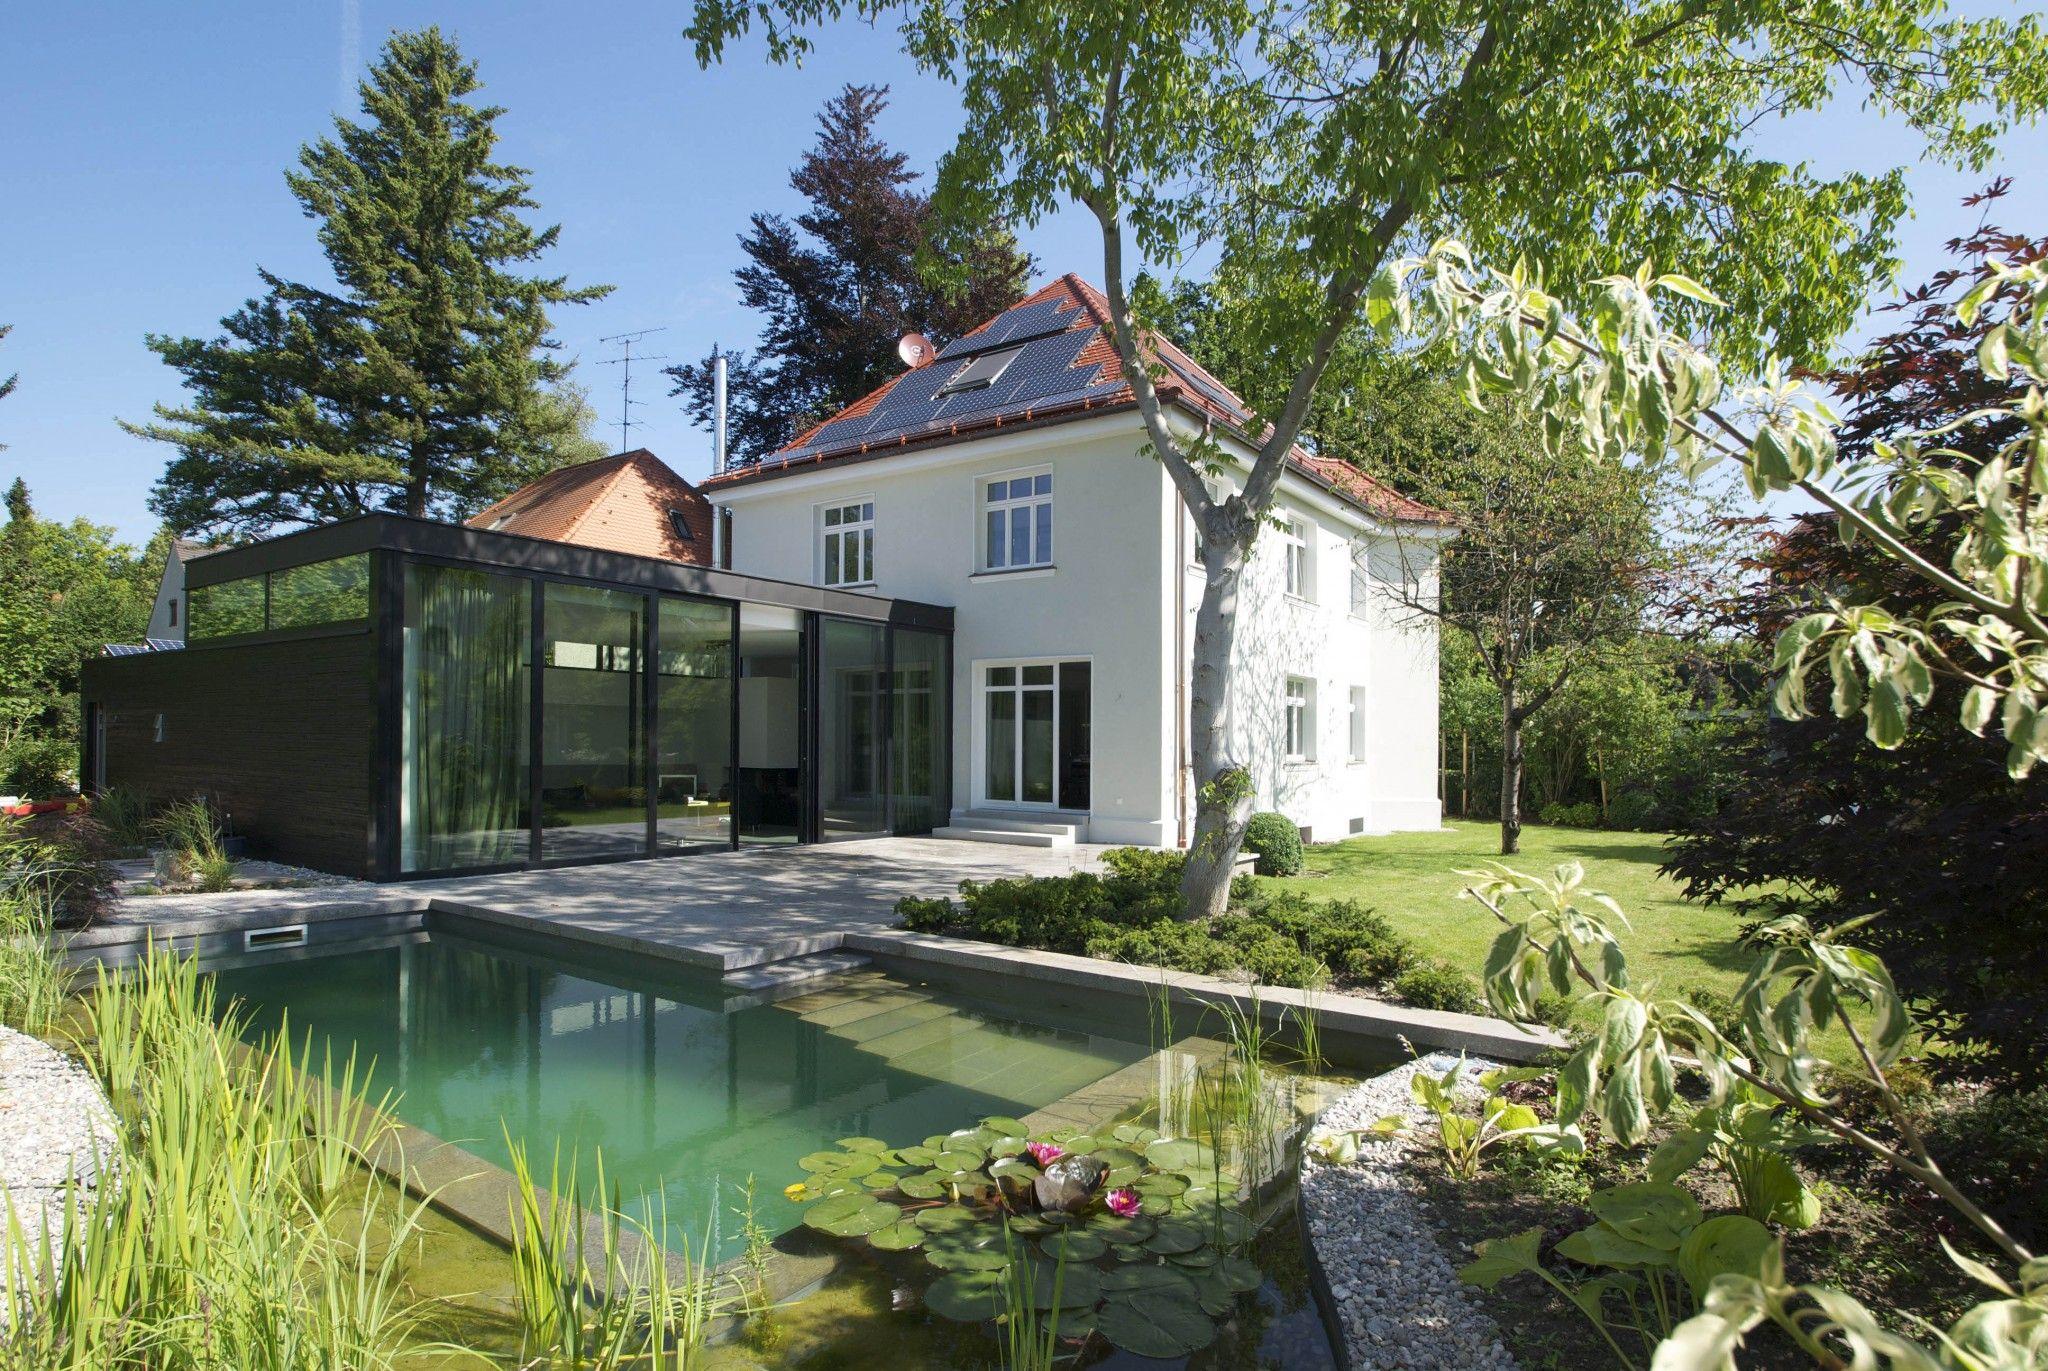 Umbau haus l houses pinterest - Altbau umbau ideen ...